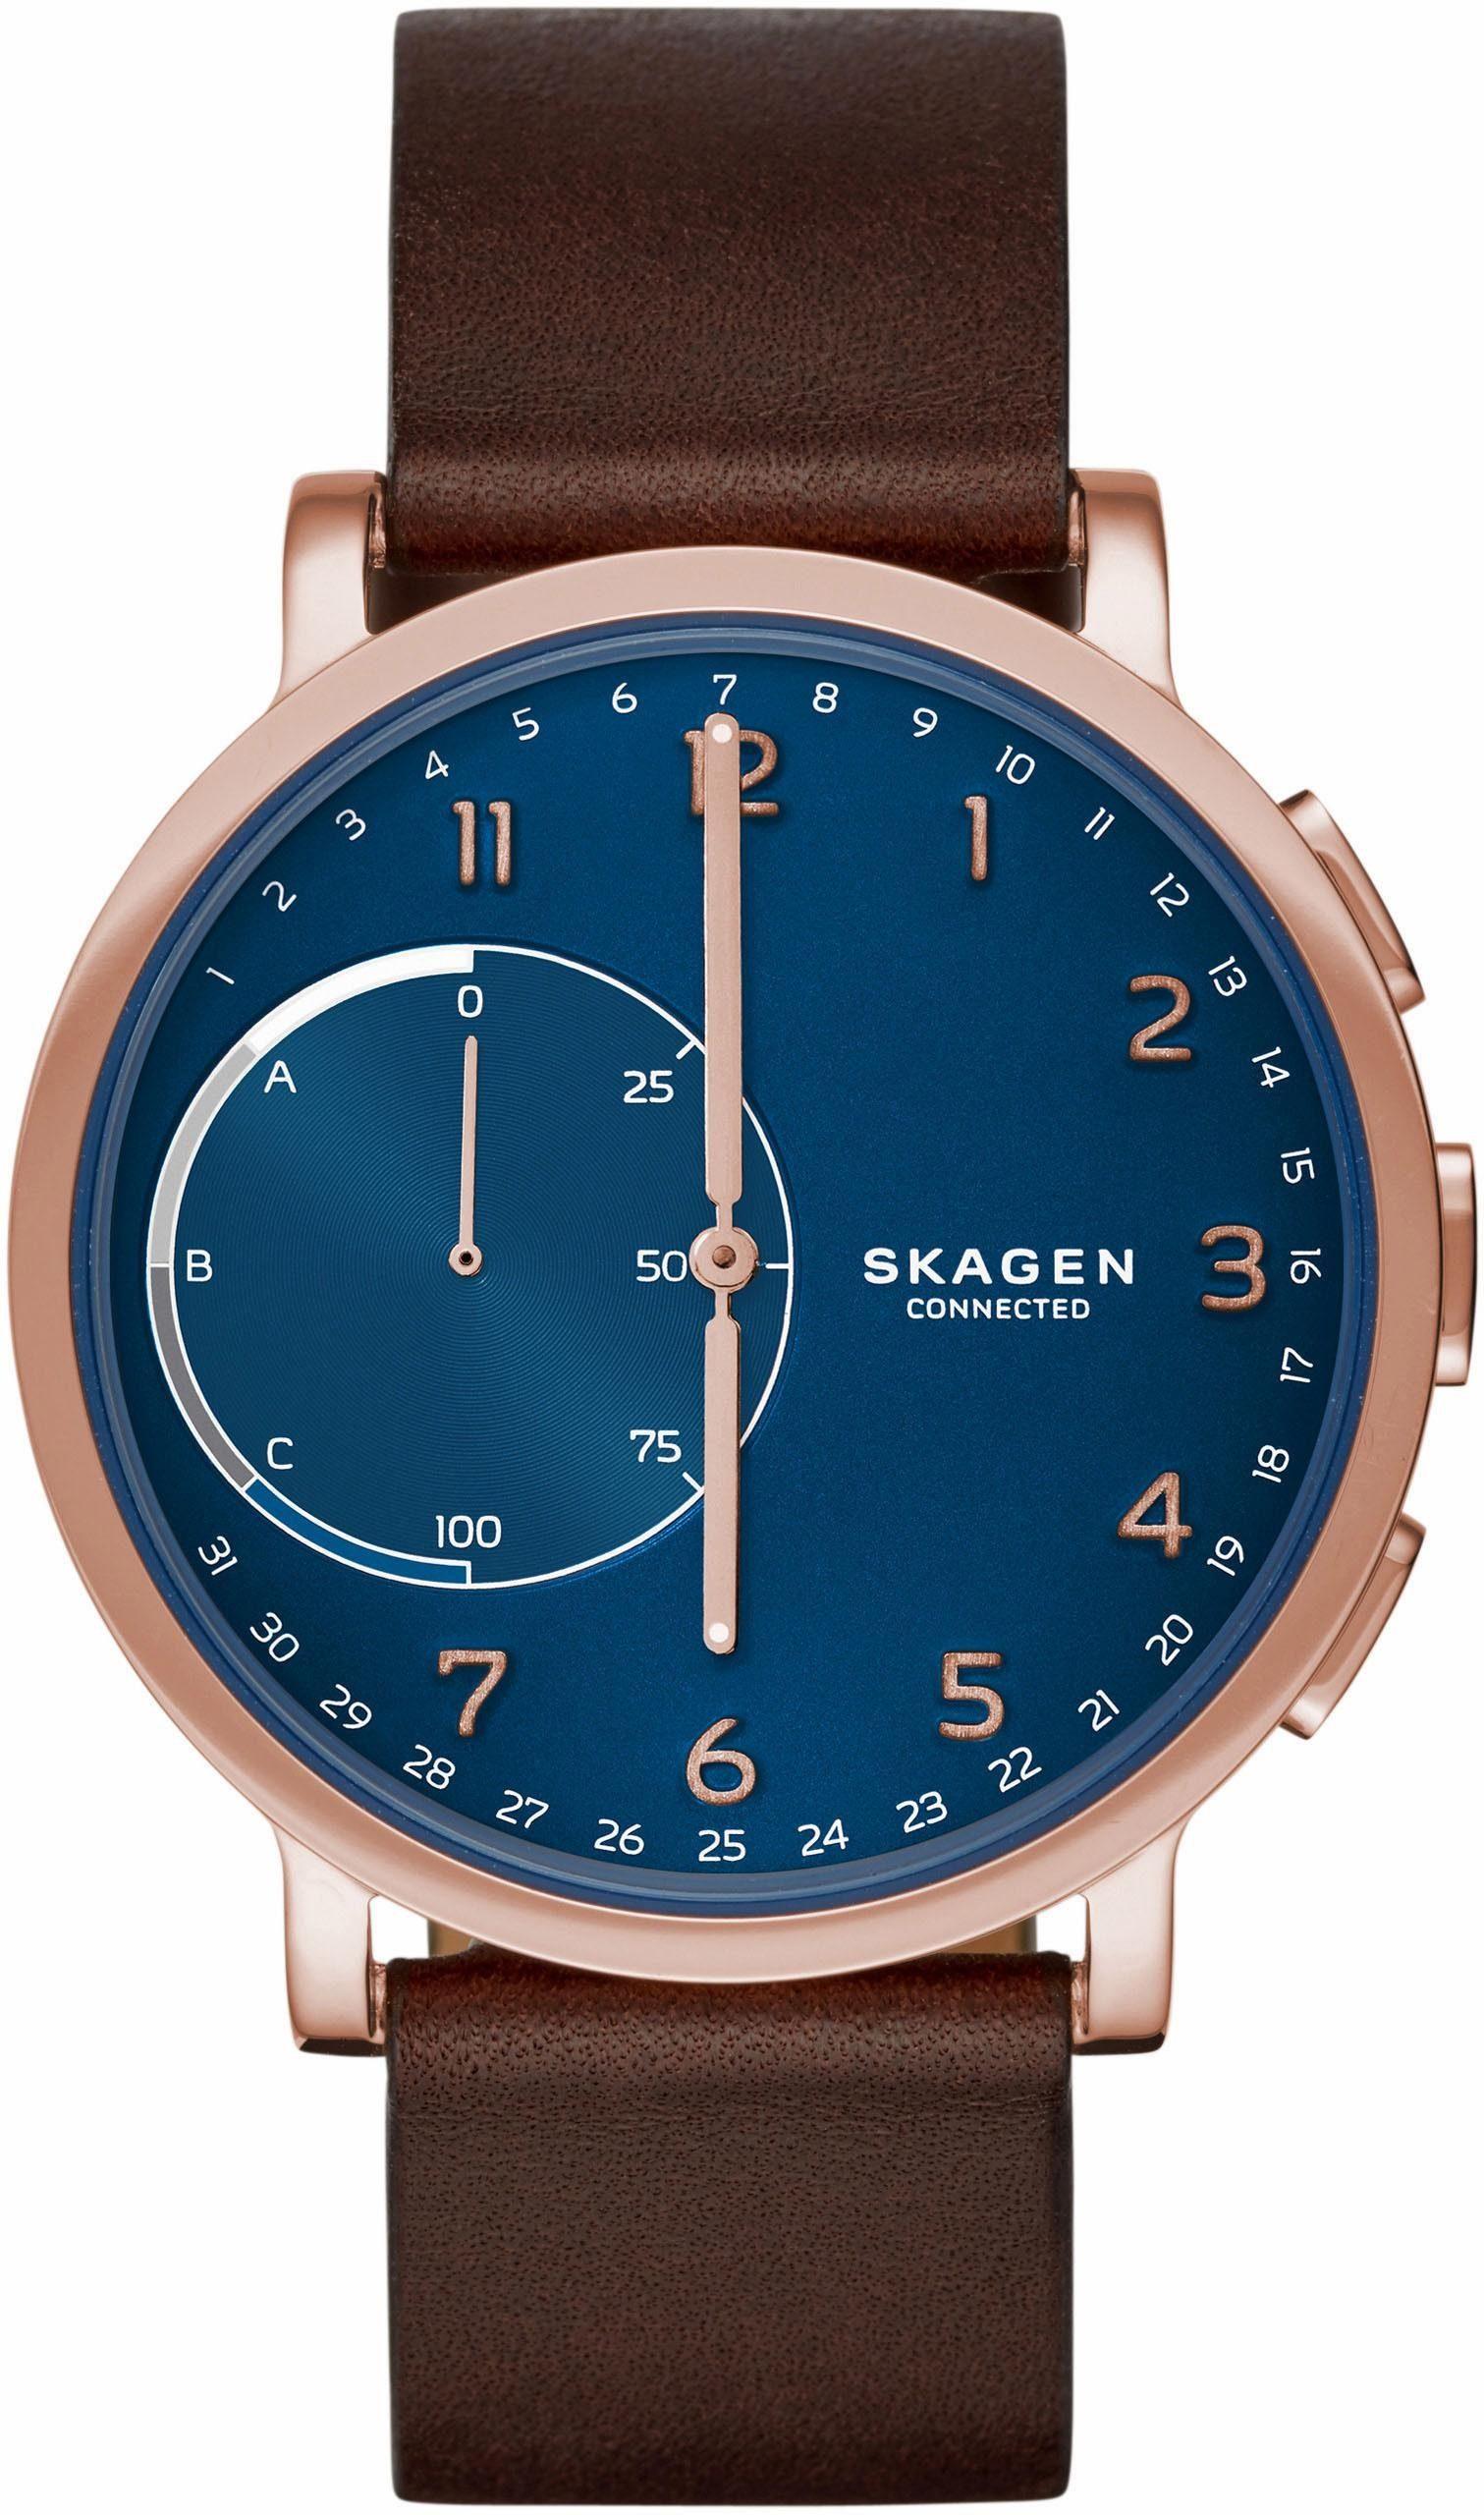 SKAGEN CONNECTED HAGEN CONNECTED, SKT1103 Smartwatch (Android Wear)